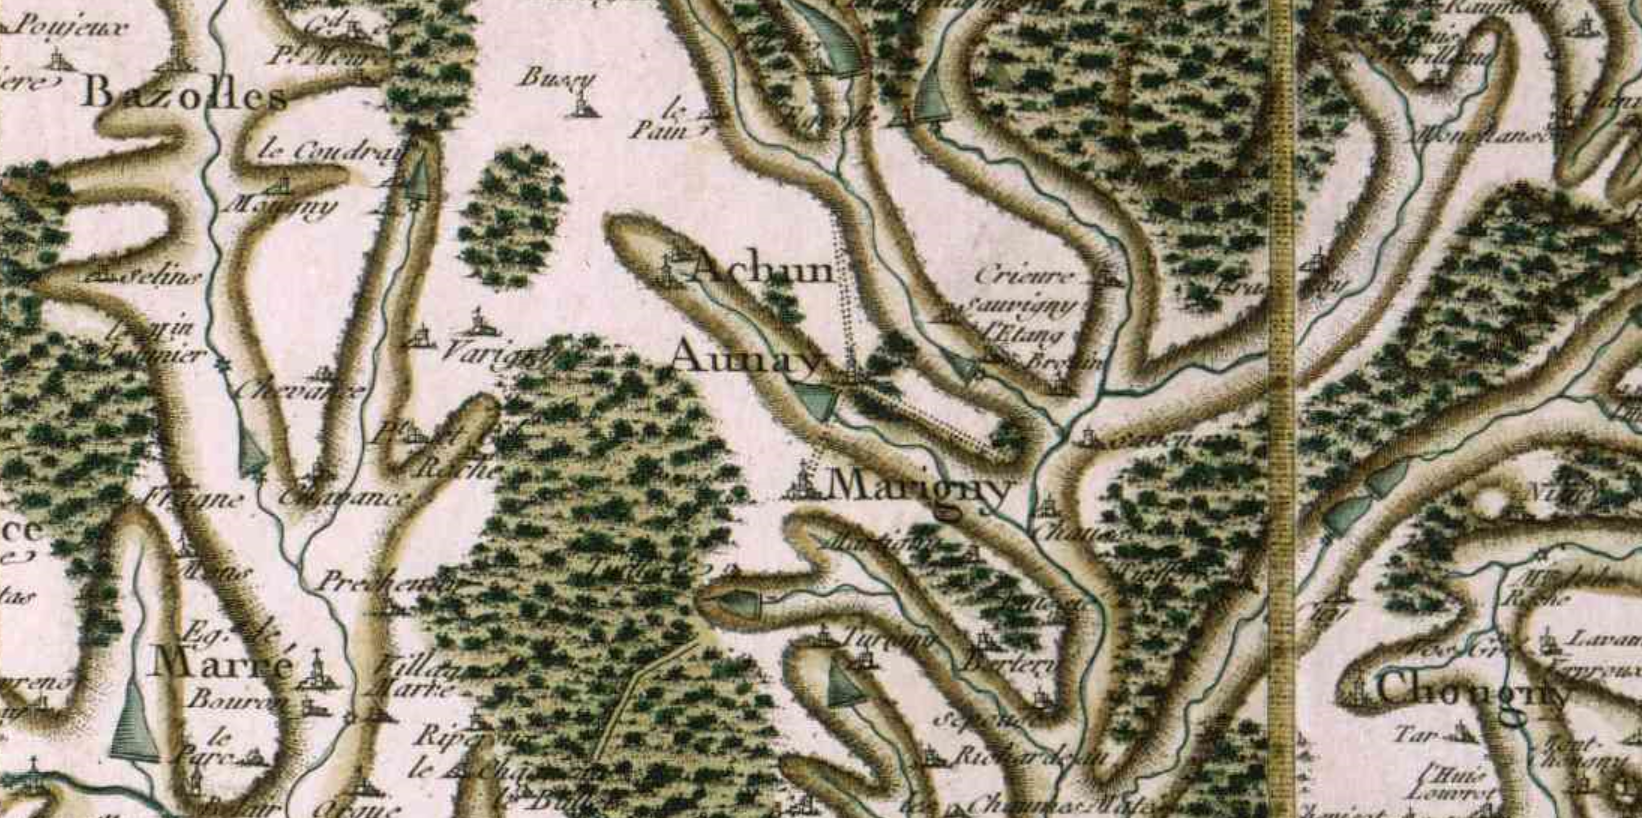 Aunay en bazois cassini